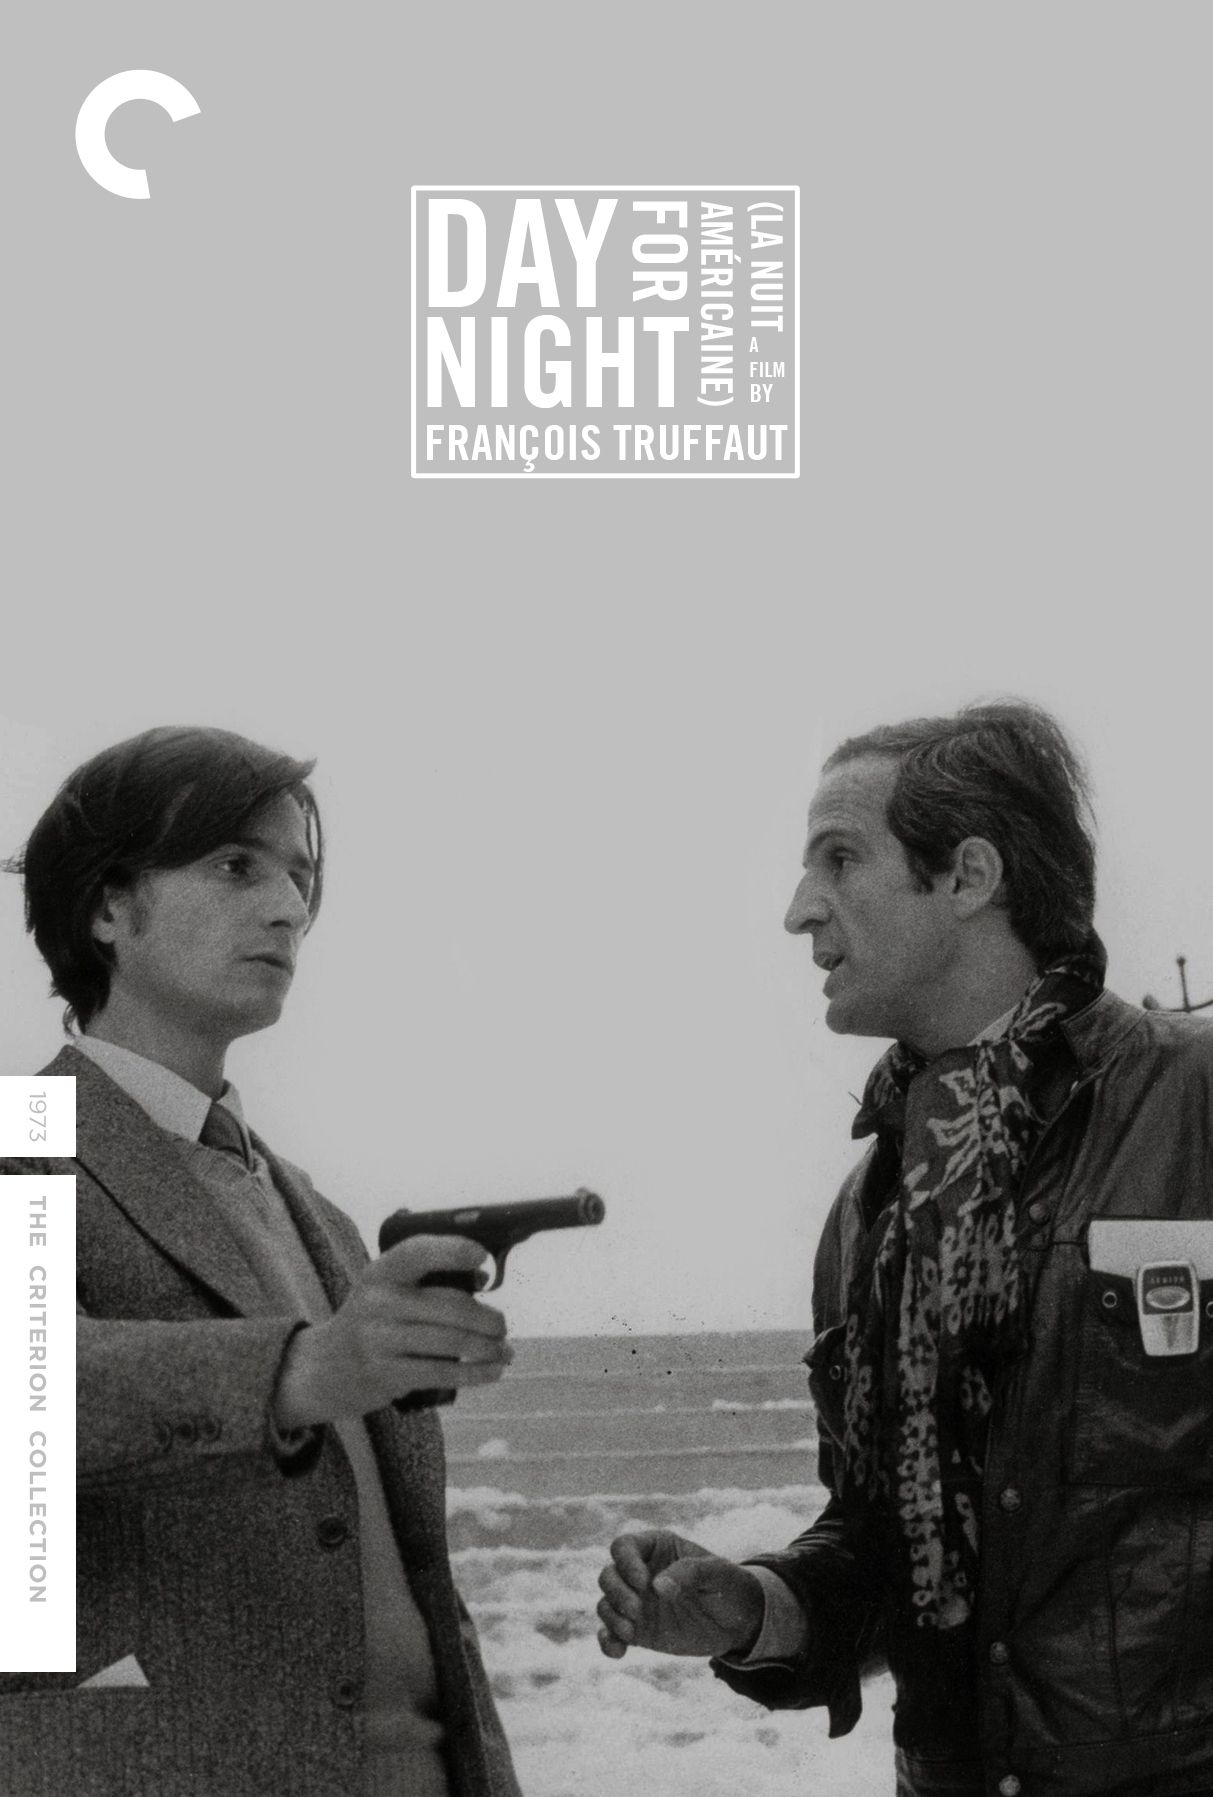 c12c4120de3a Fake Criterion for François Truffaut's Day for Night | Films I Love ...